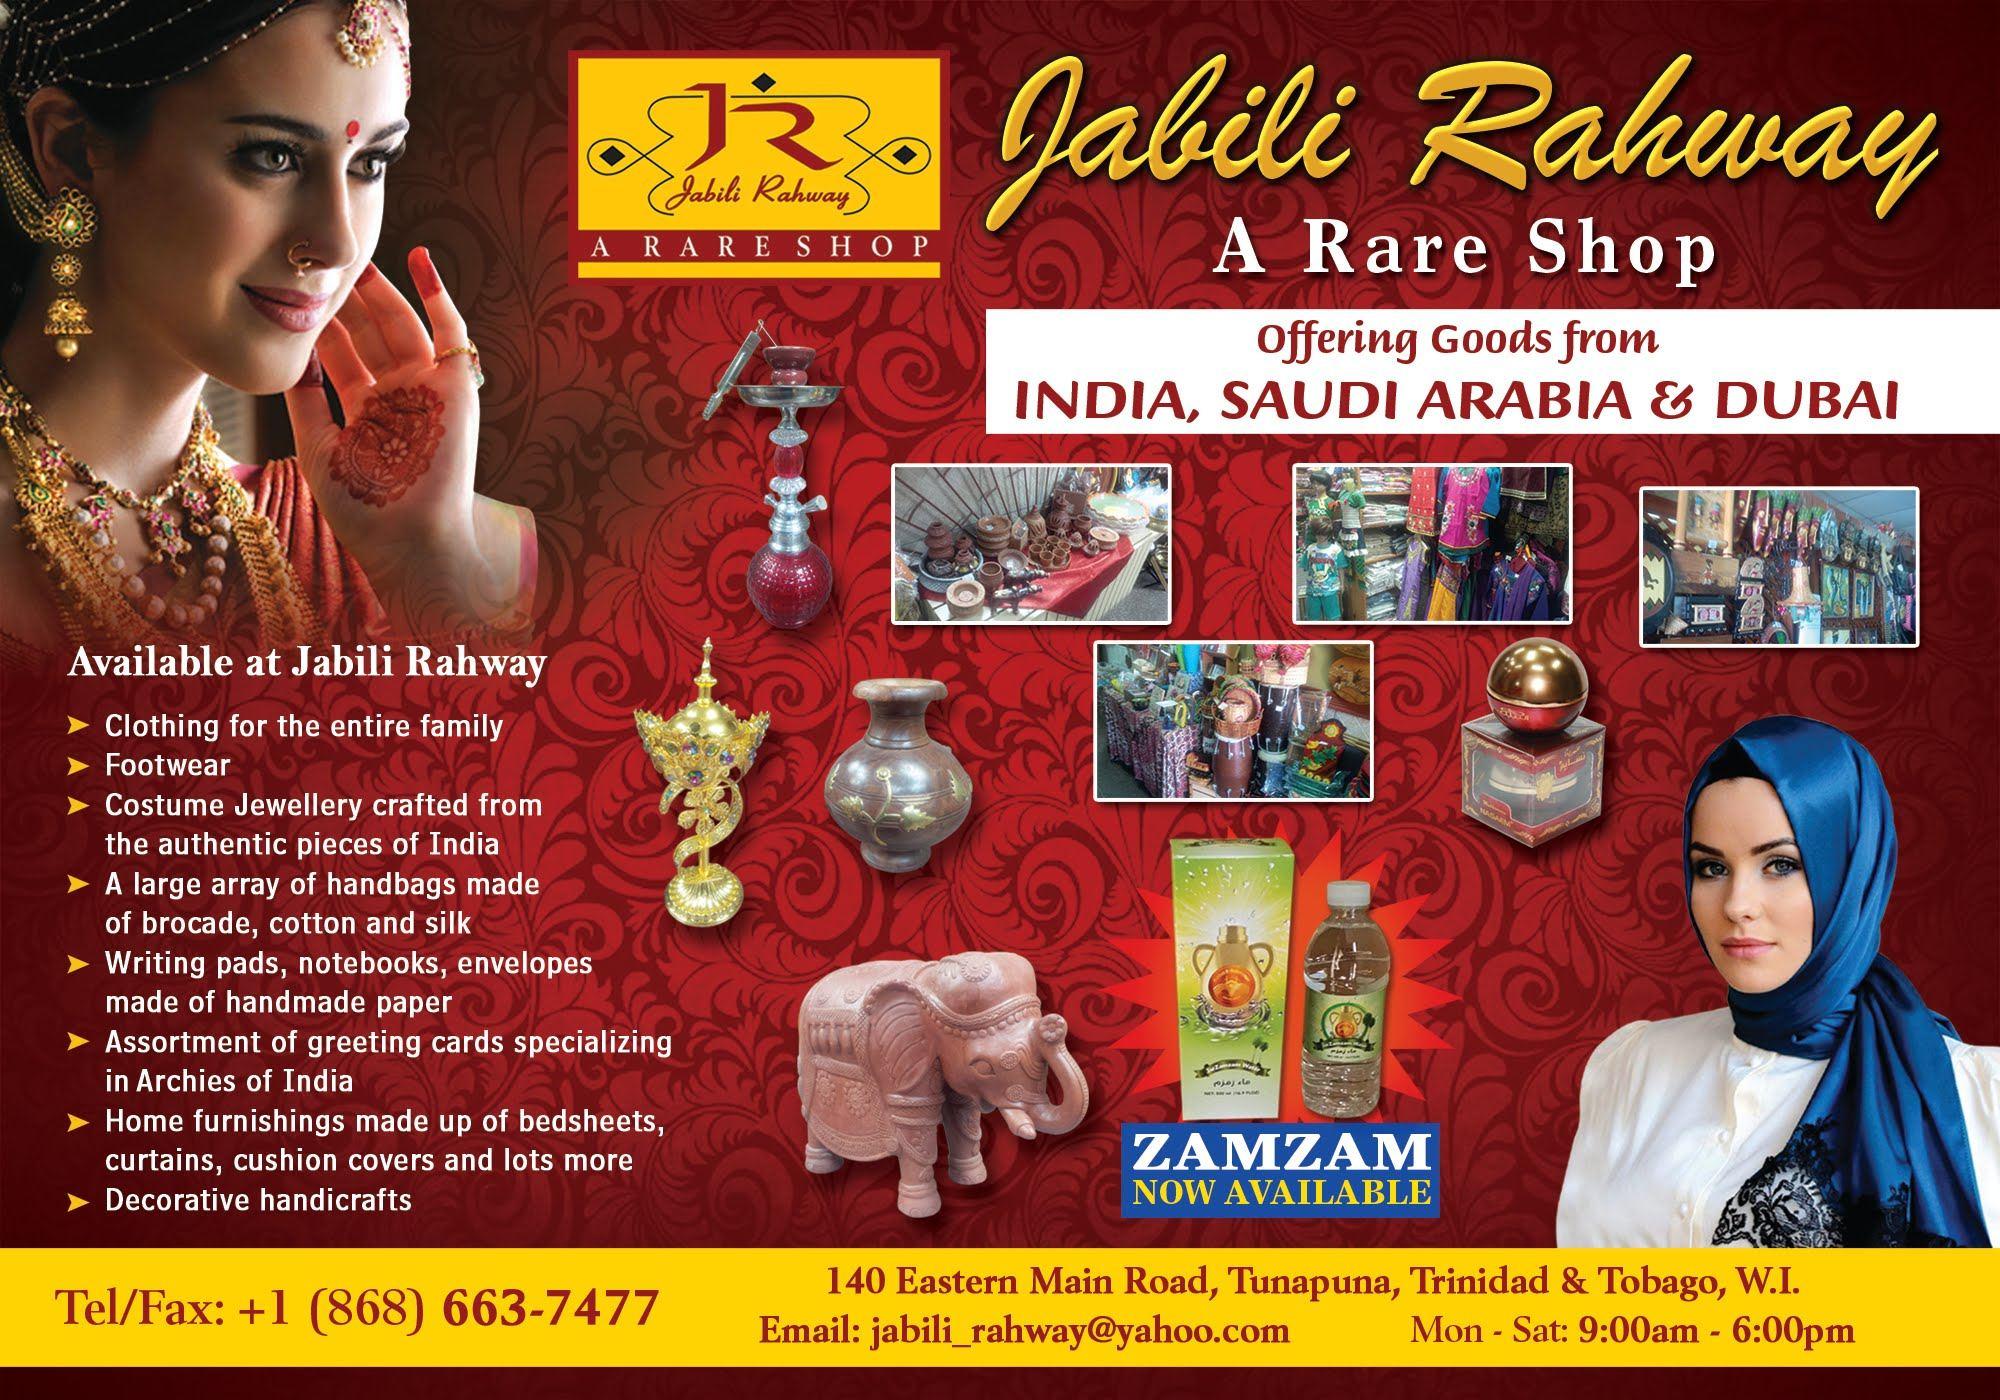 Jabili Rahway